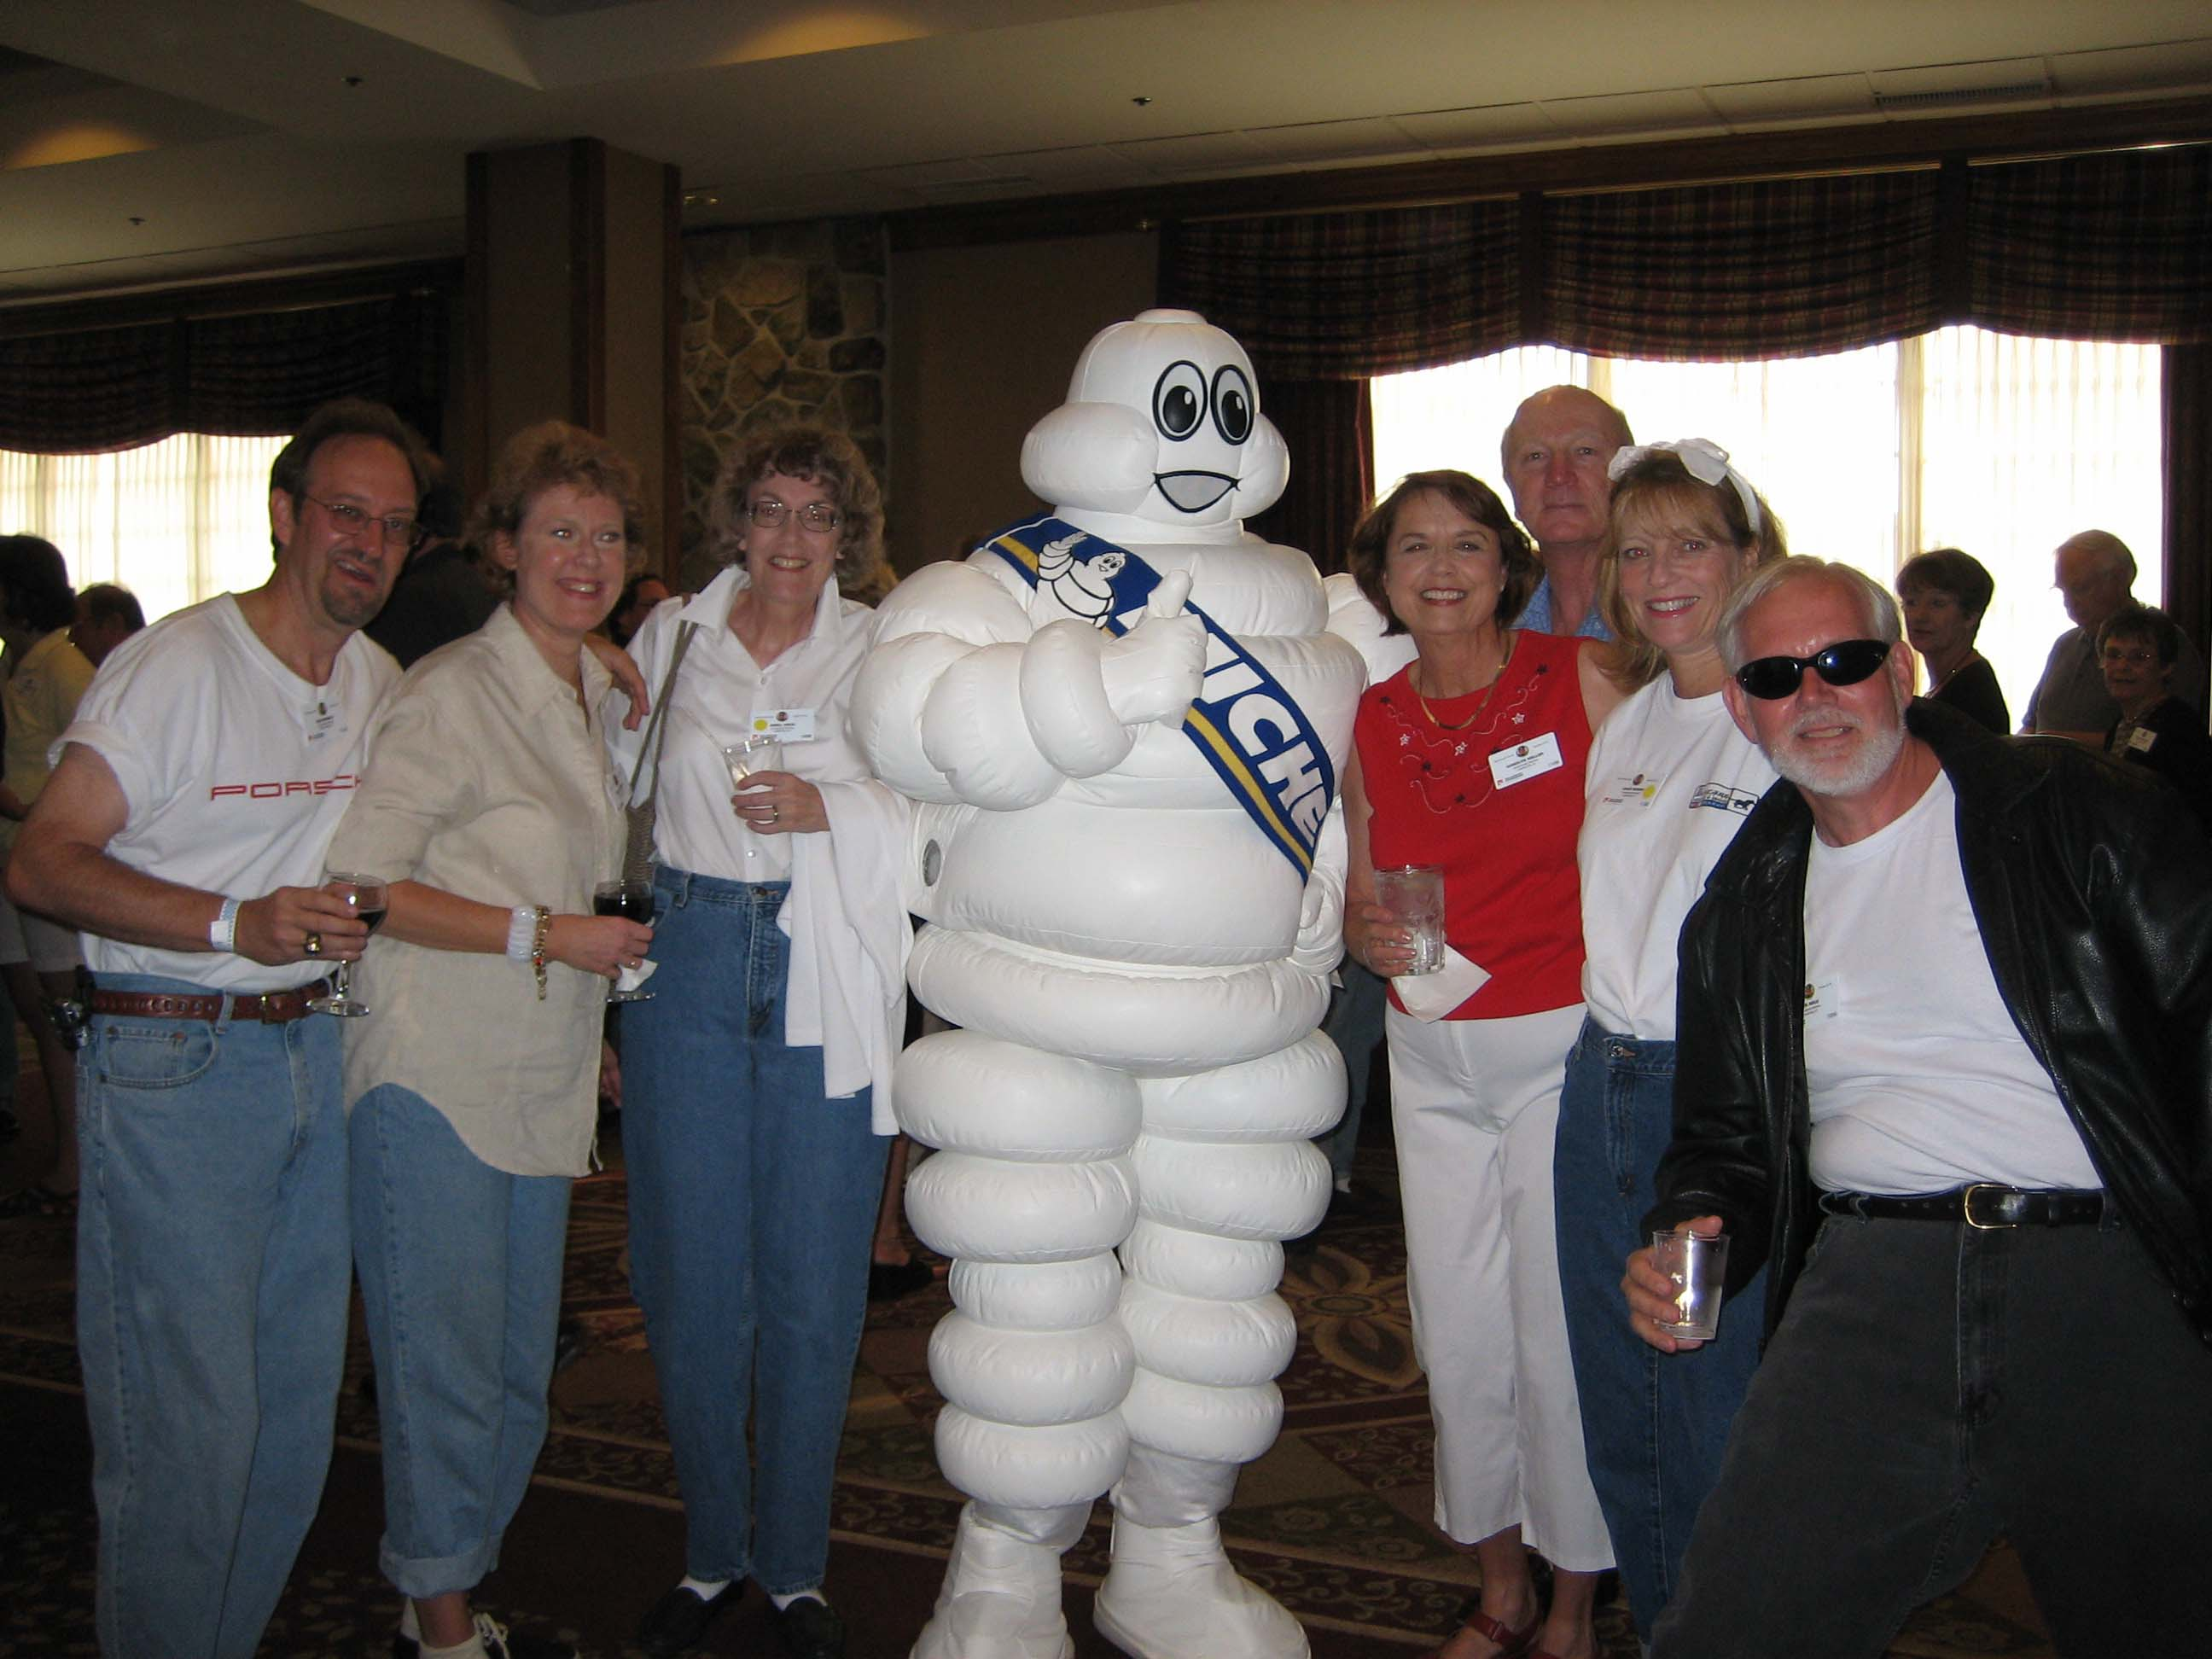 2005-Porsche-Parade-BGR-Memebers-with-Michelin-Man